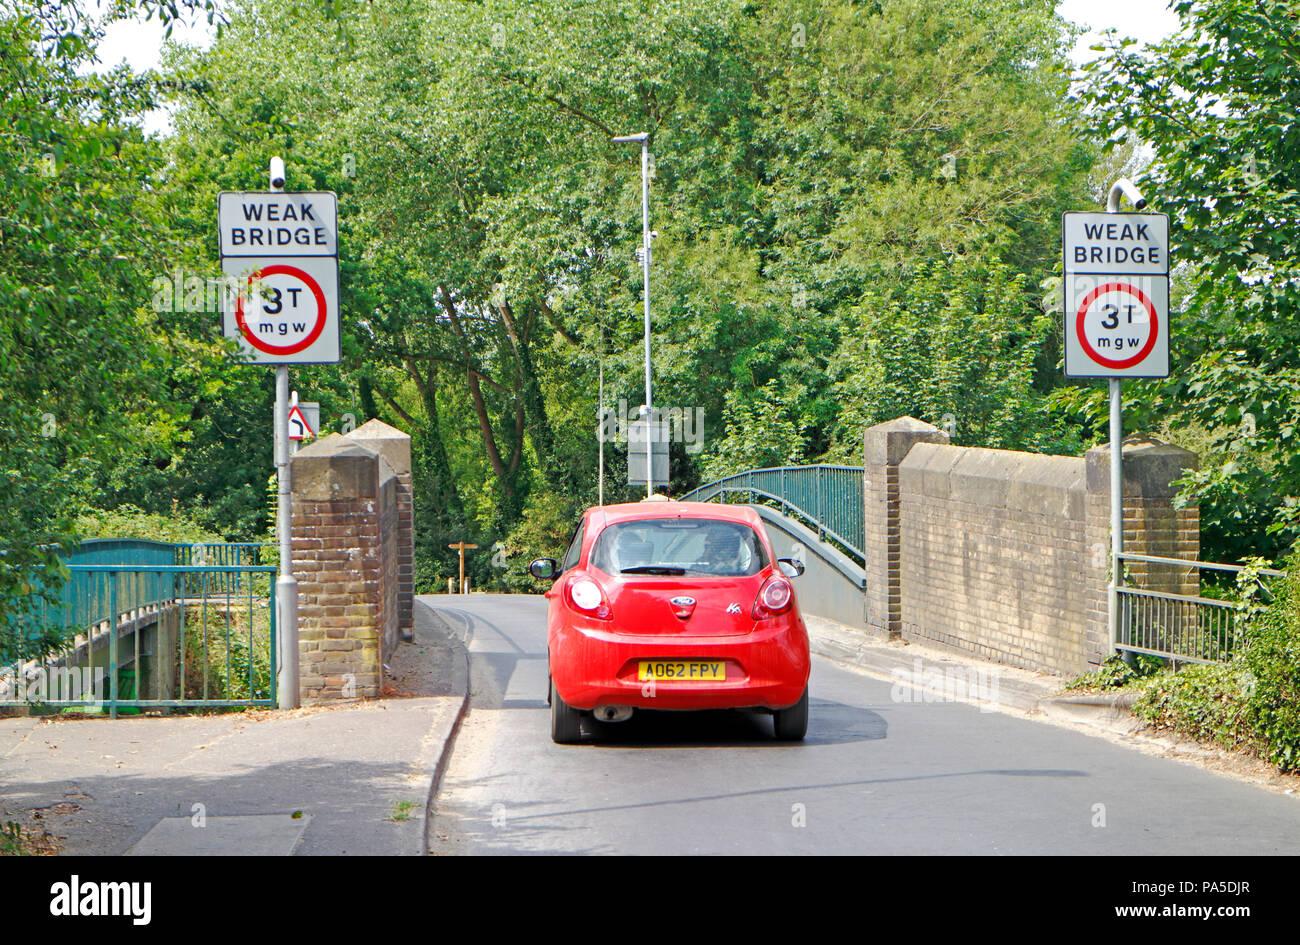 The single track Hellesdon Road Bridge crossing the River Wensum in Hellesdon, Norfolk, England, United Kingdom, Europe. - Stock Image